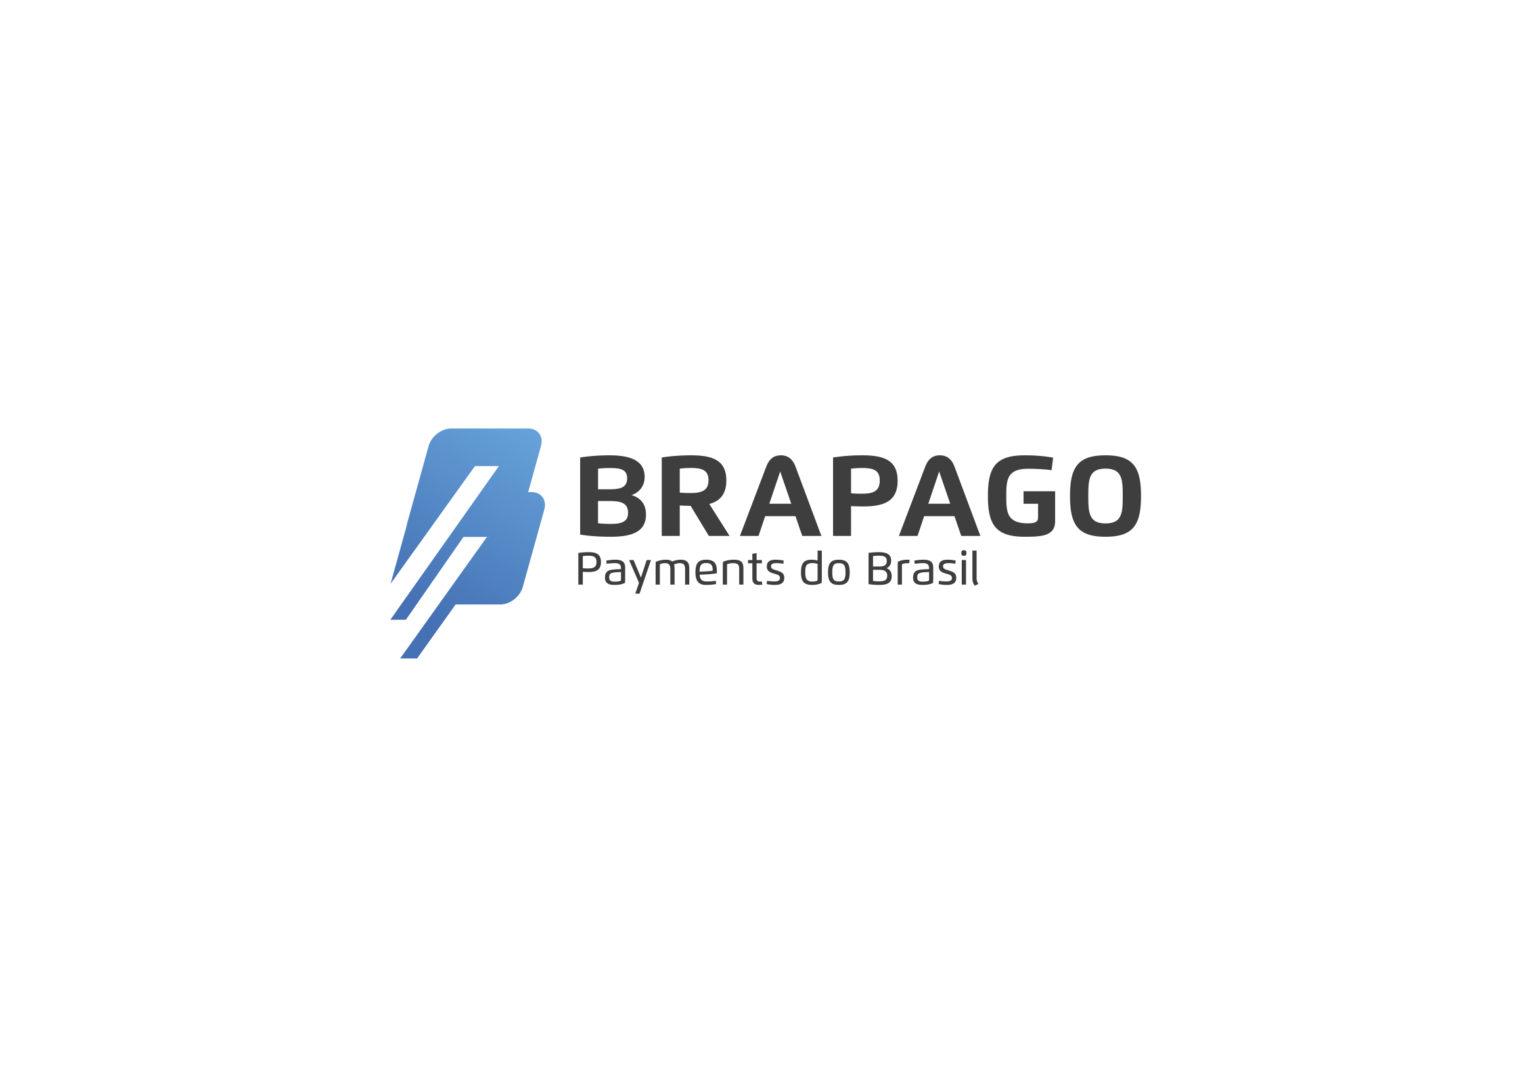 Logo Brapago